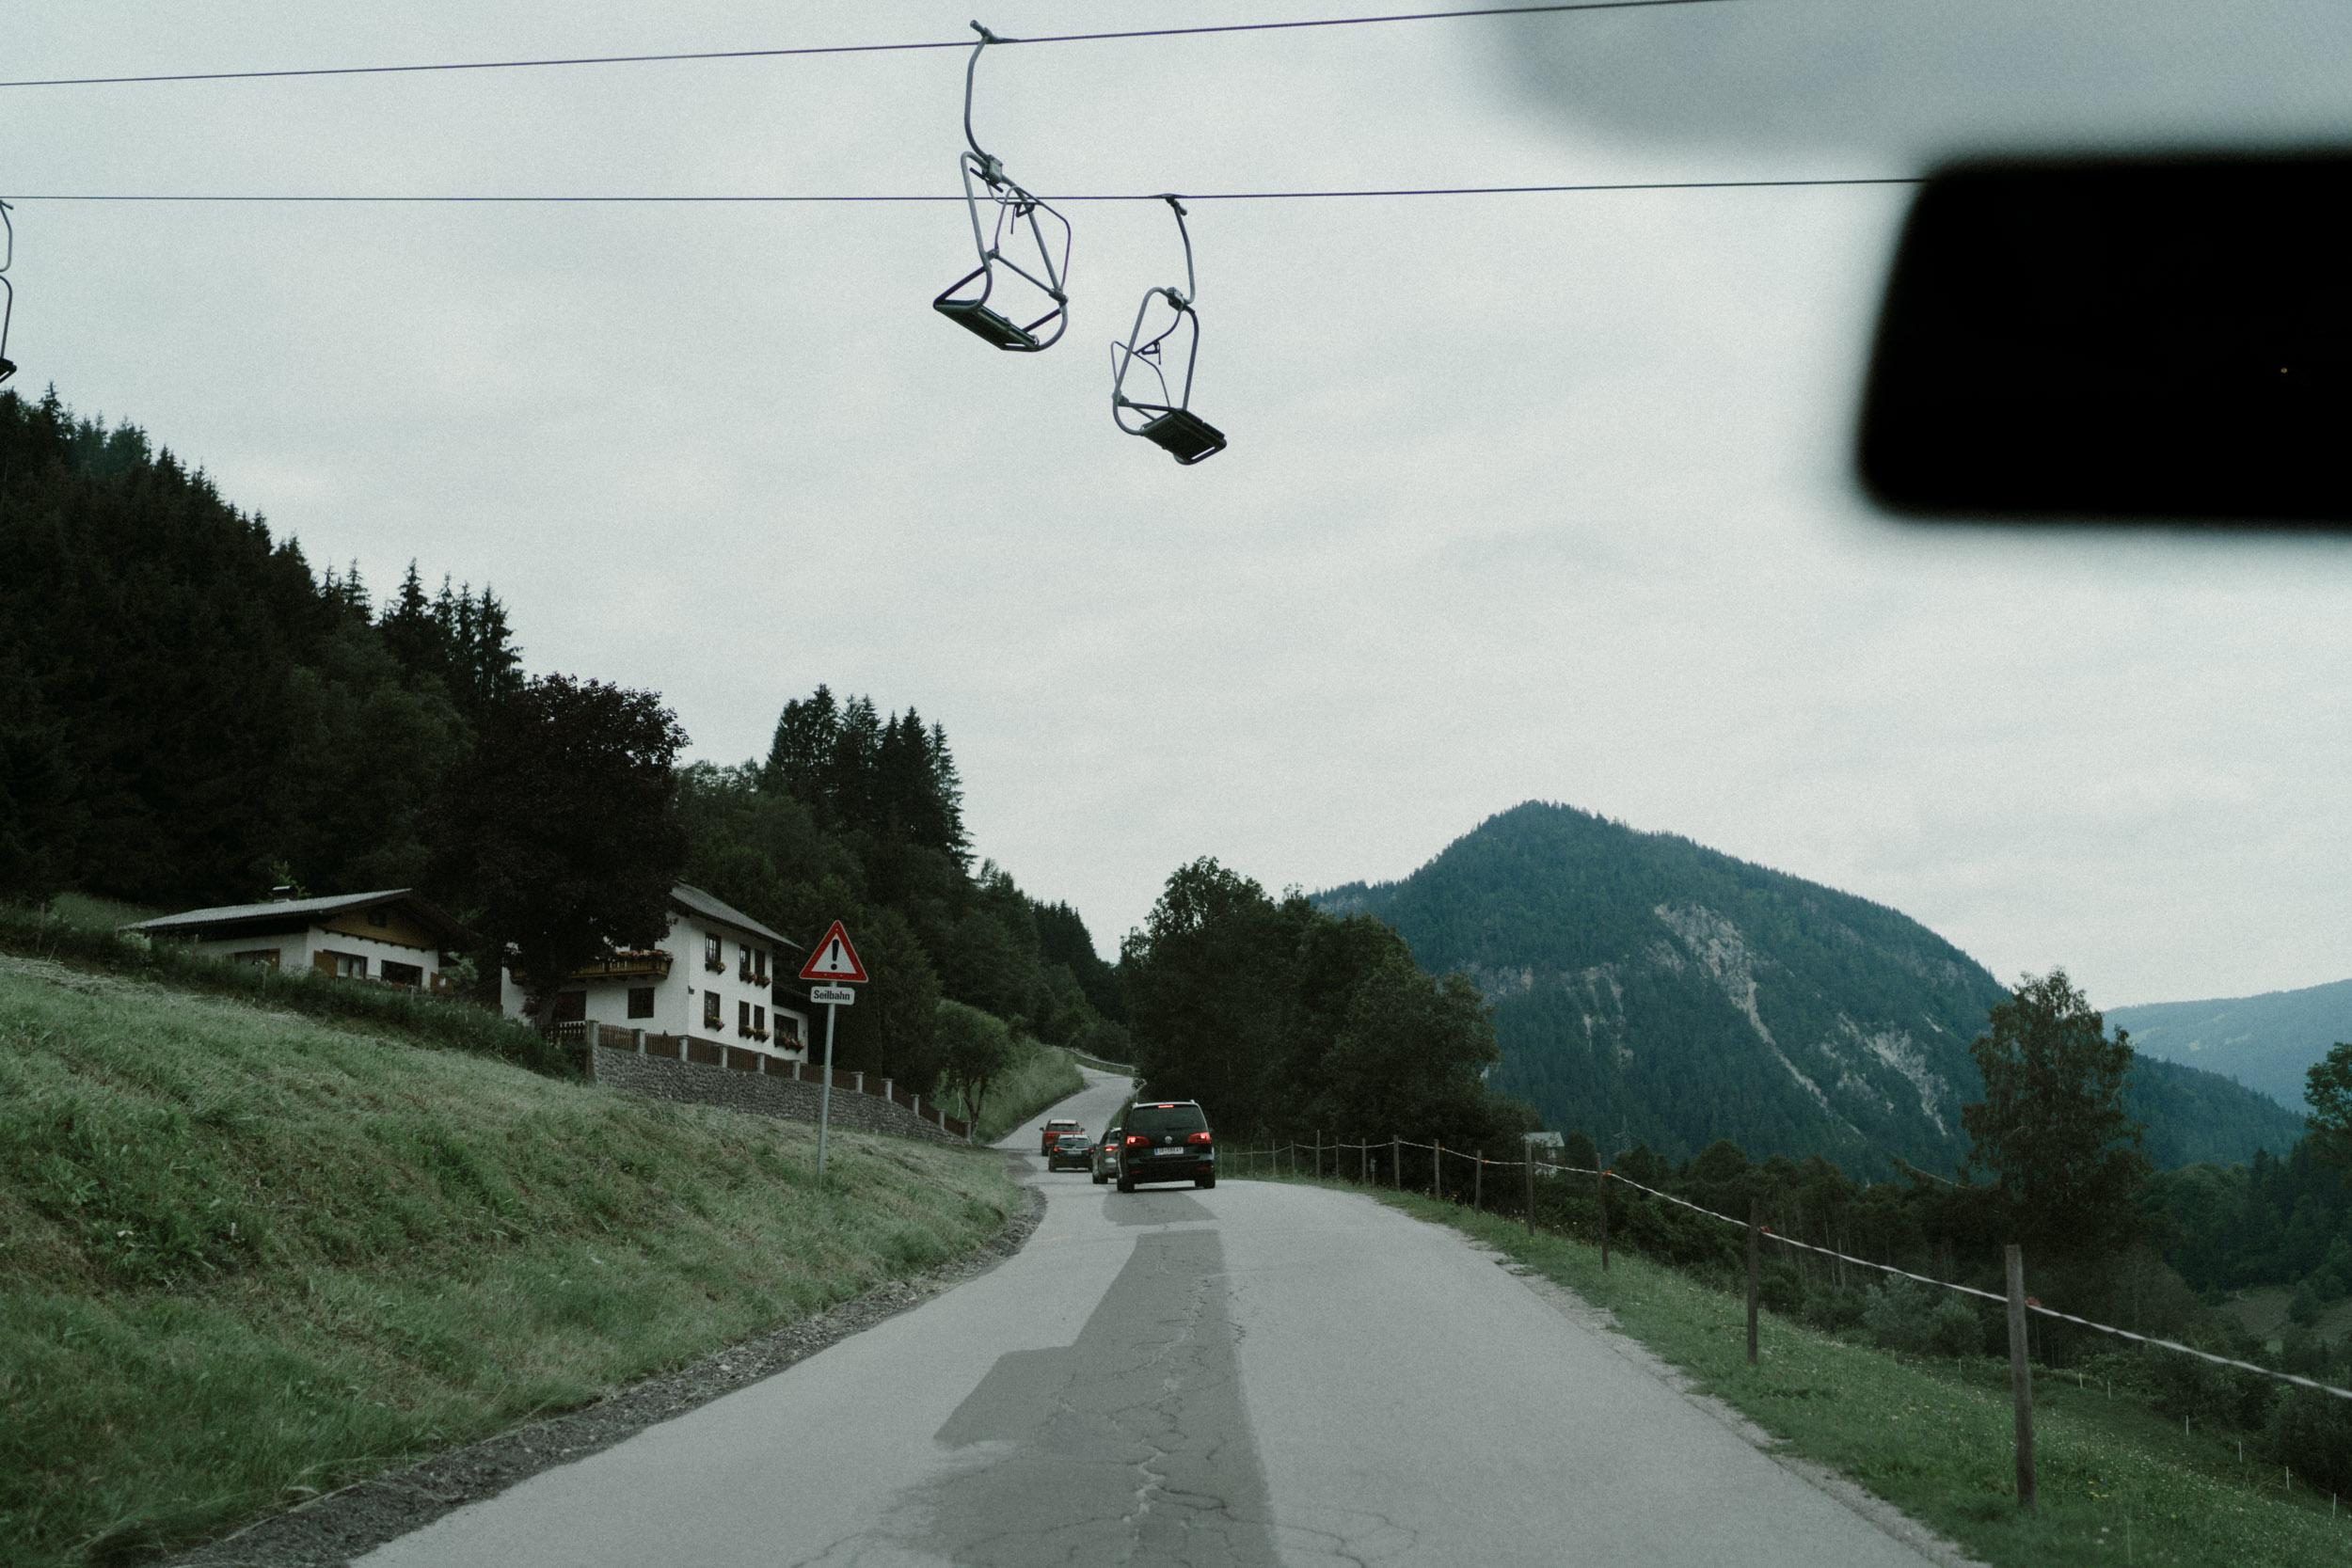 austria_mountain_wedding_photography_countryside_vienna-3.jpg